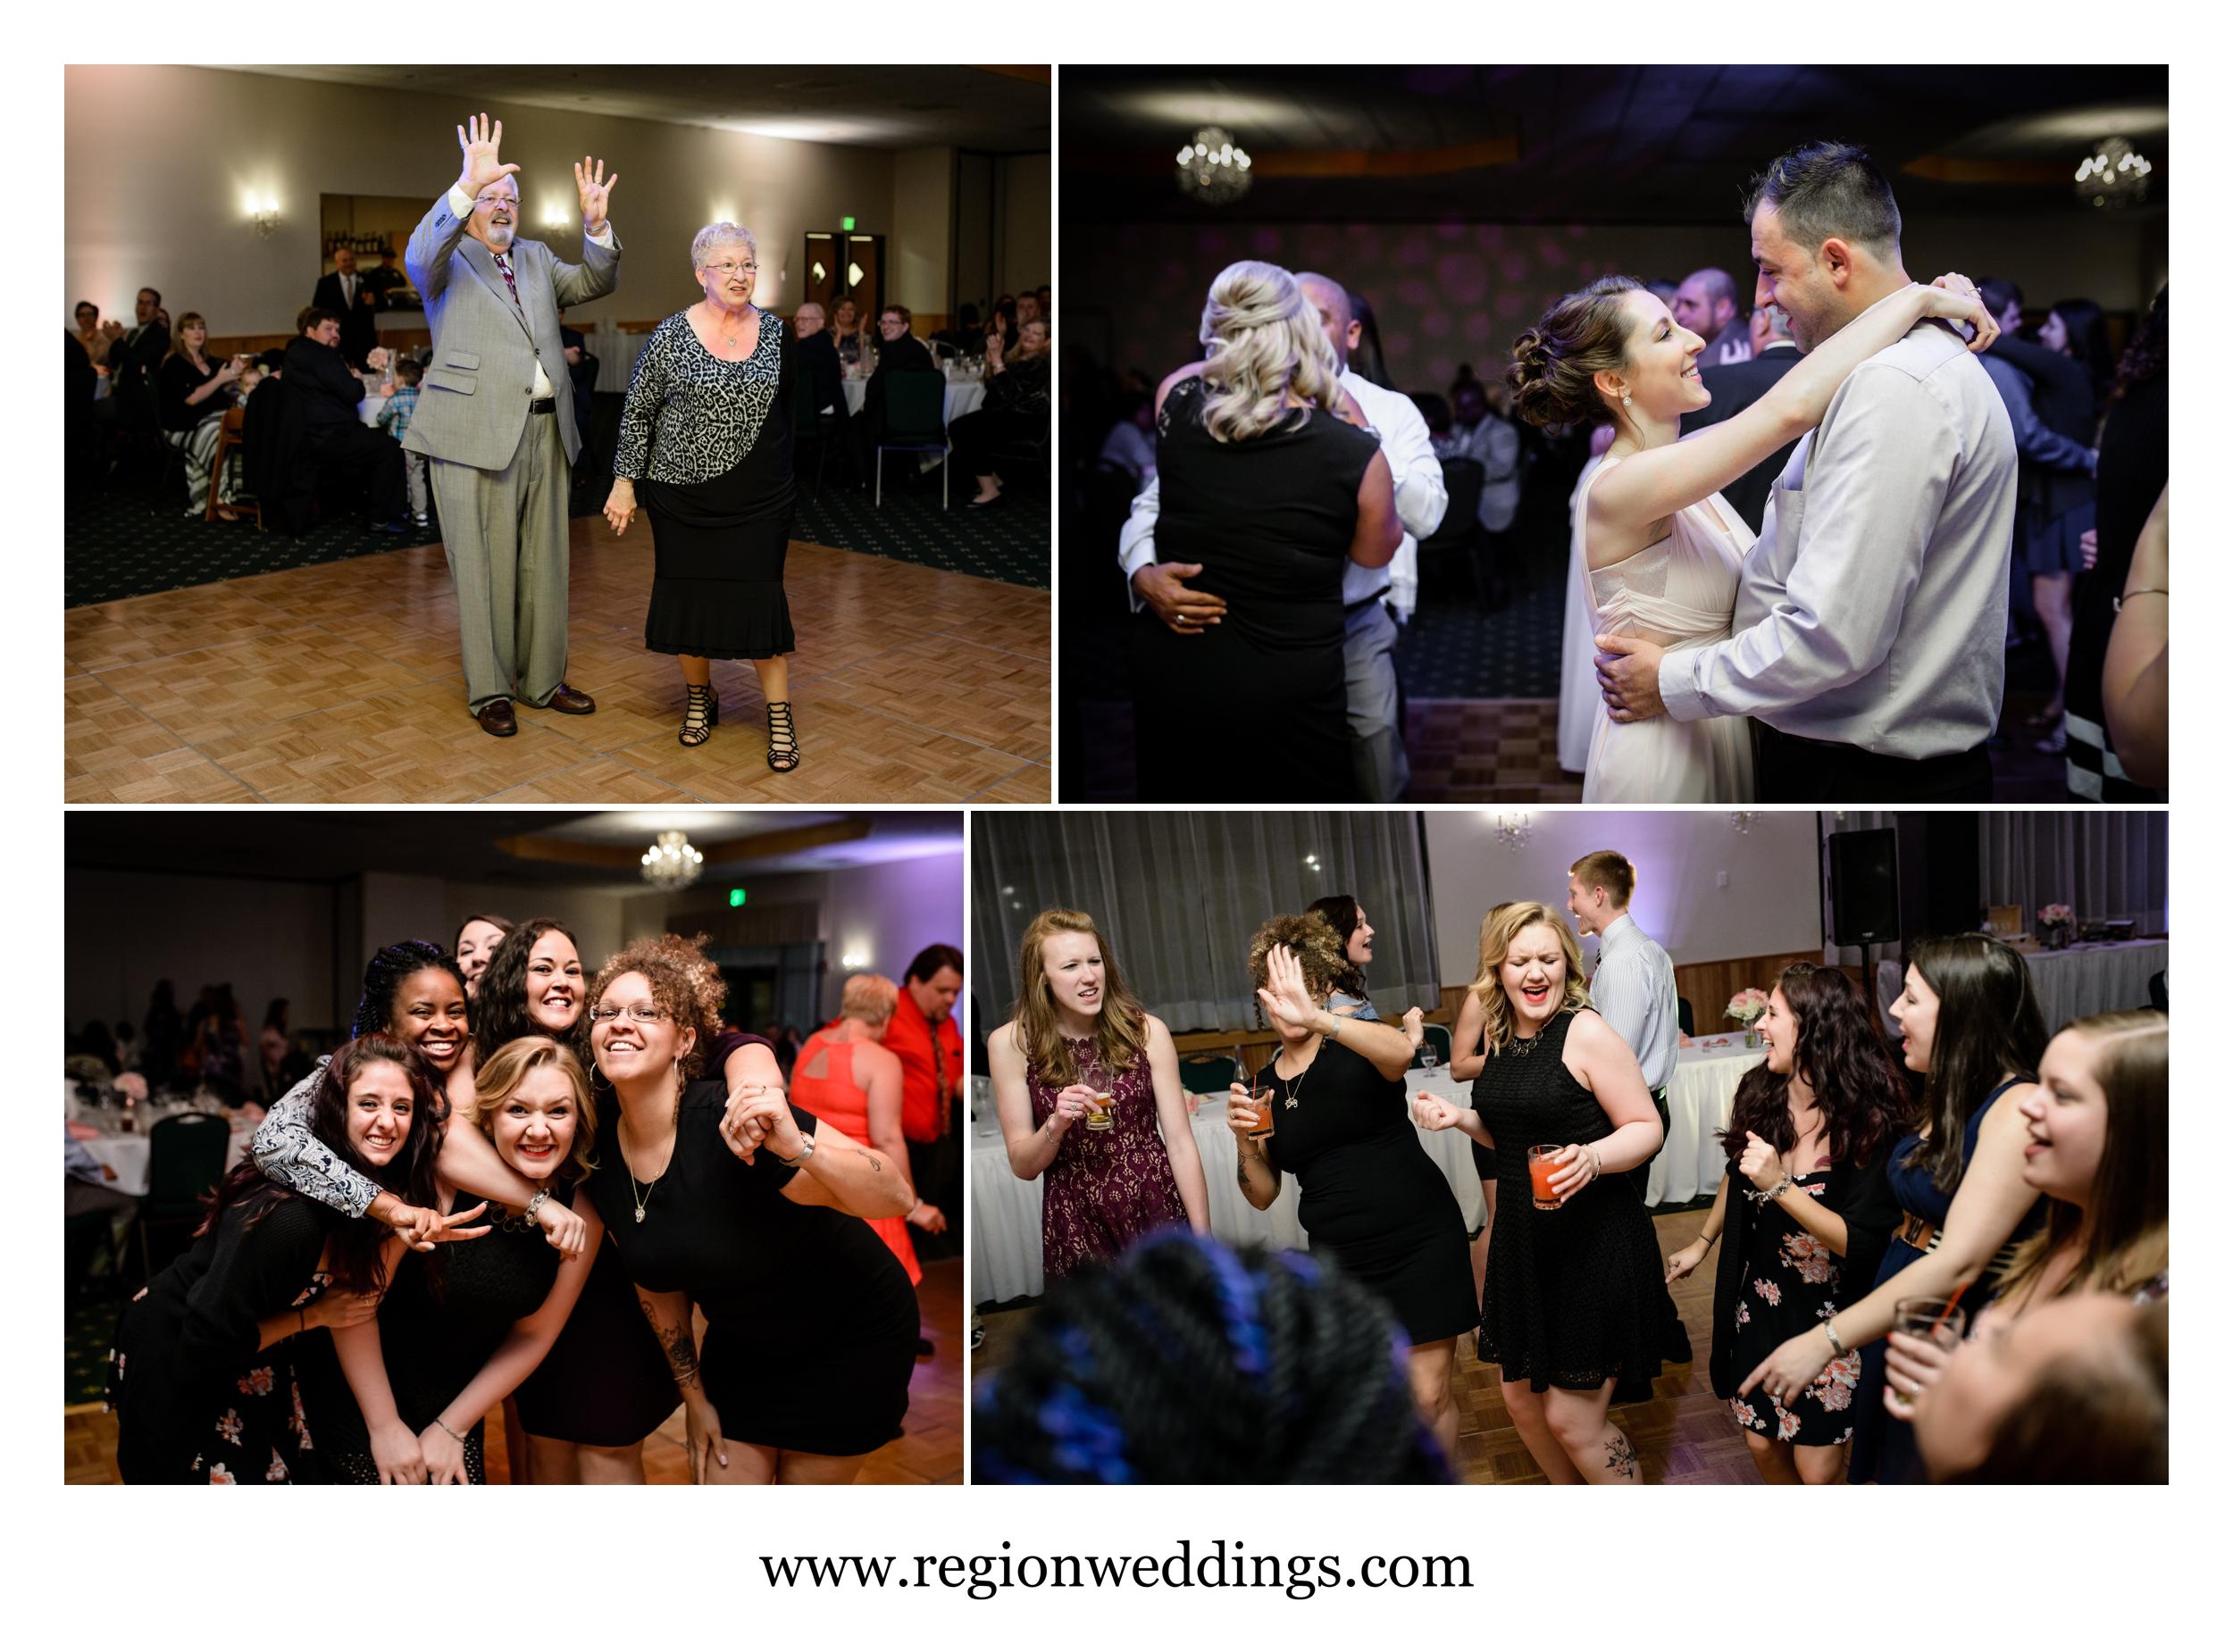 Wedding reception fun at The Patrician.